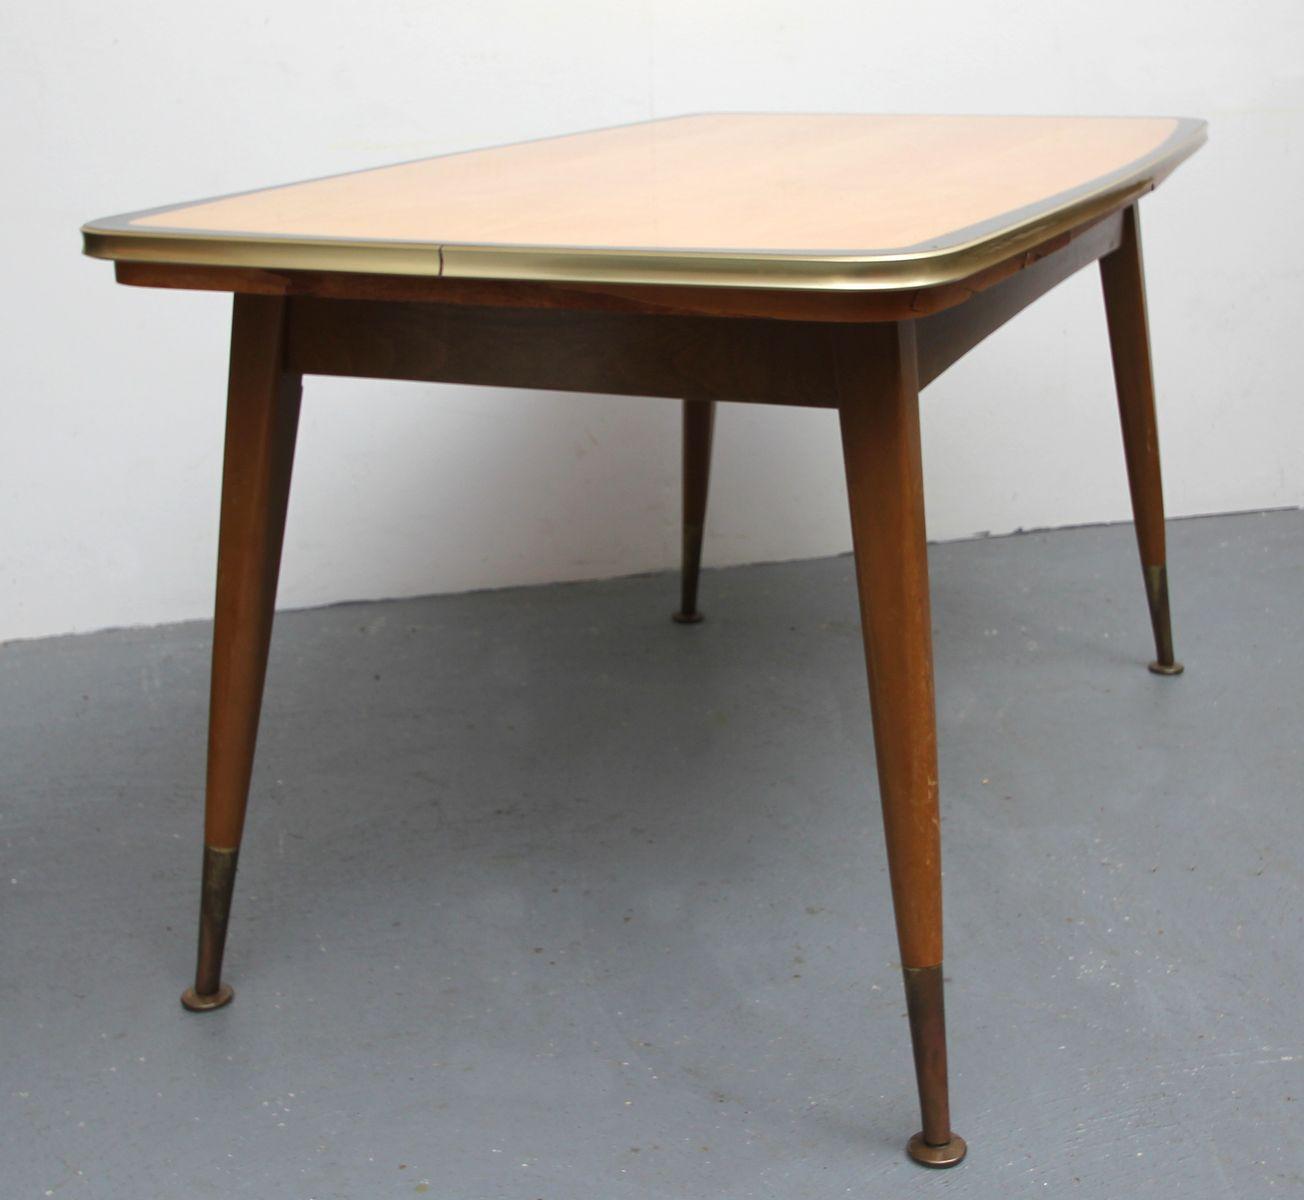 Table basse hauteur ajustable en rable 1950s en vente sur pamono - Table basse ajustable en hauteur ...